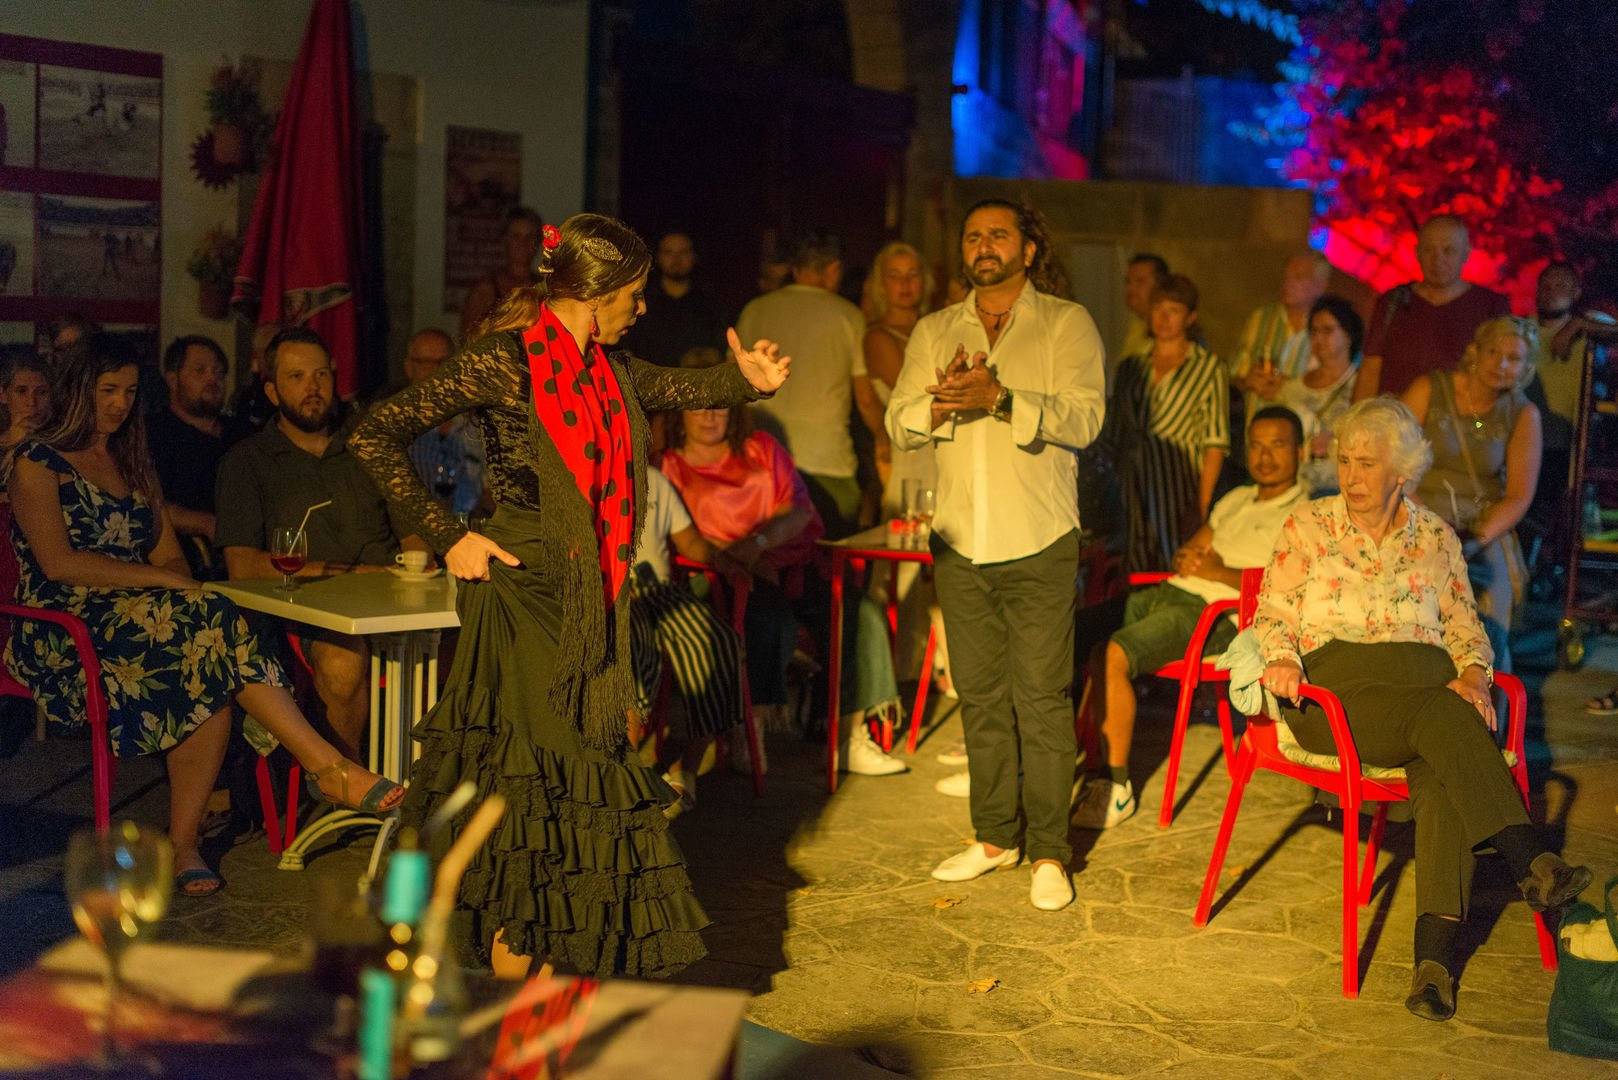 clients enjoying the flamenco show